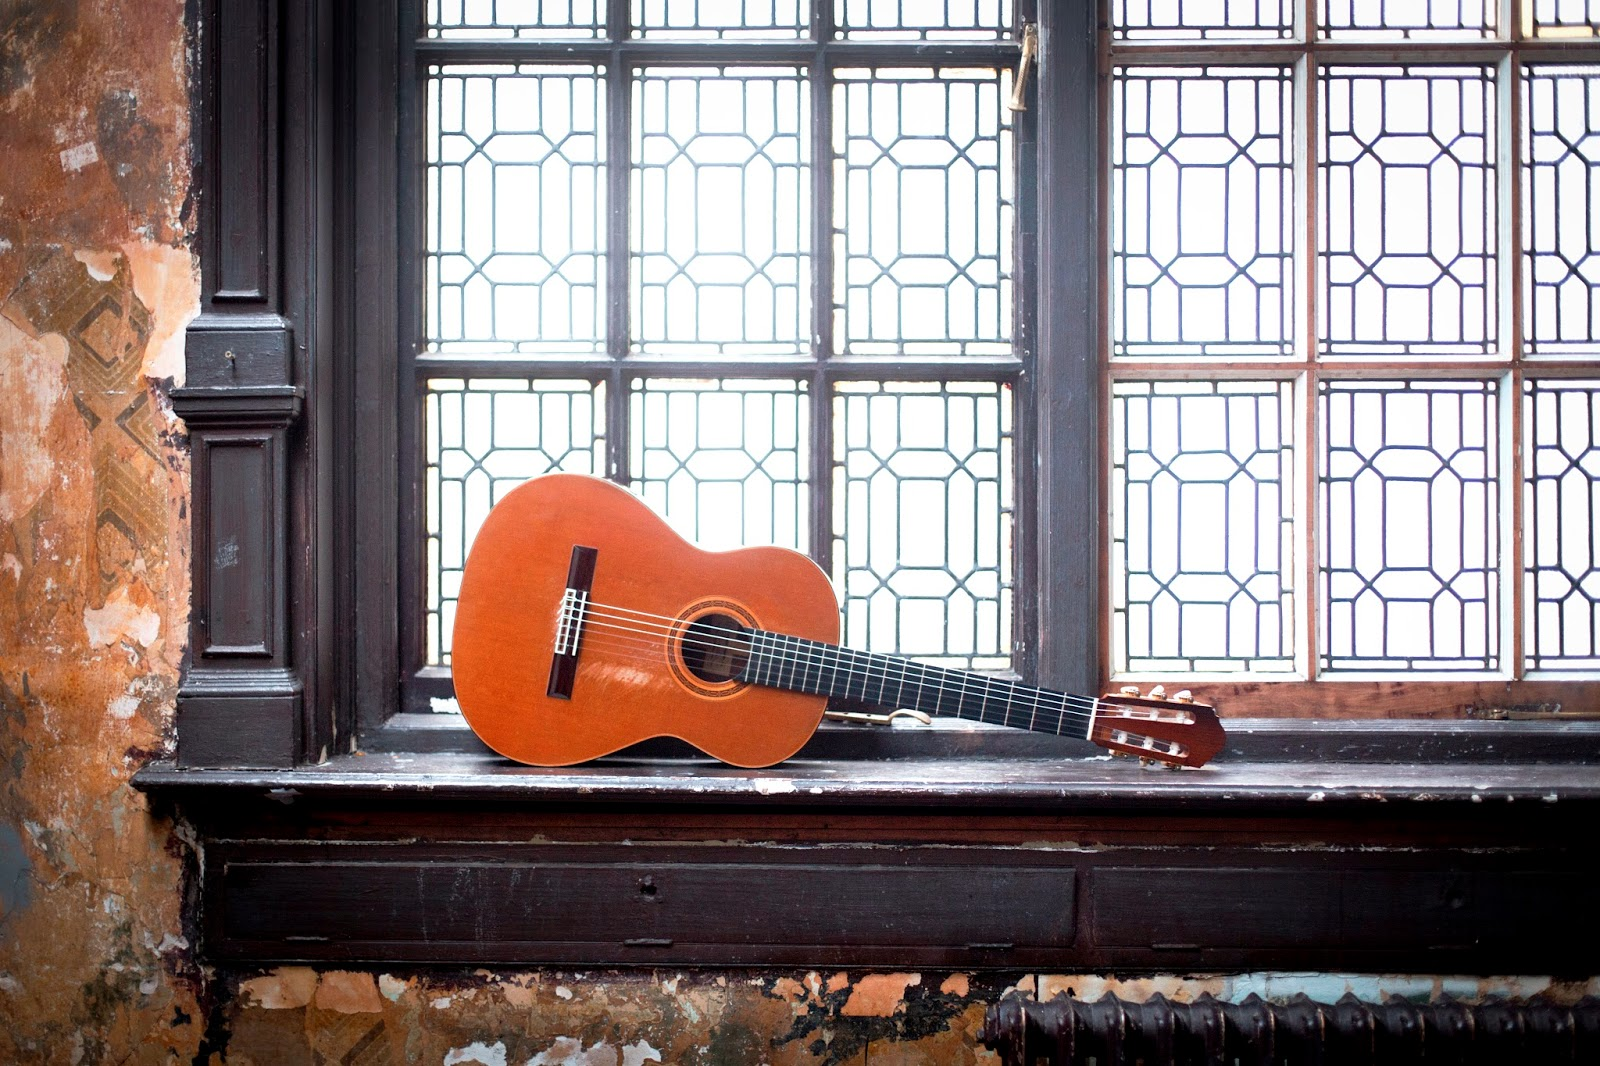 Christoph Denoth's guitar - photo credit: Benjamin Ealovega.